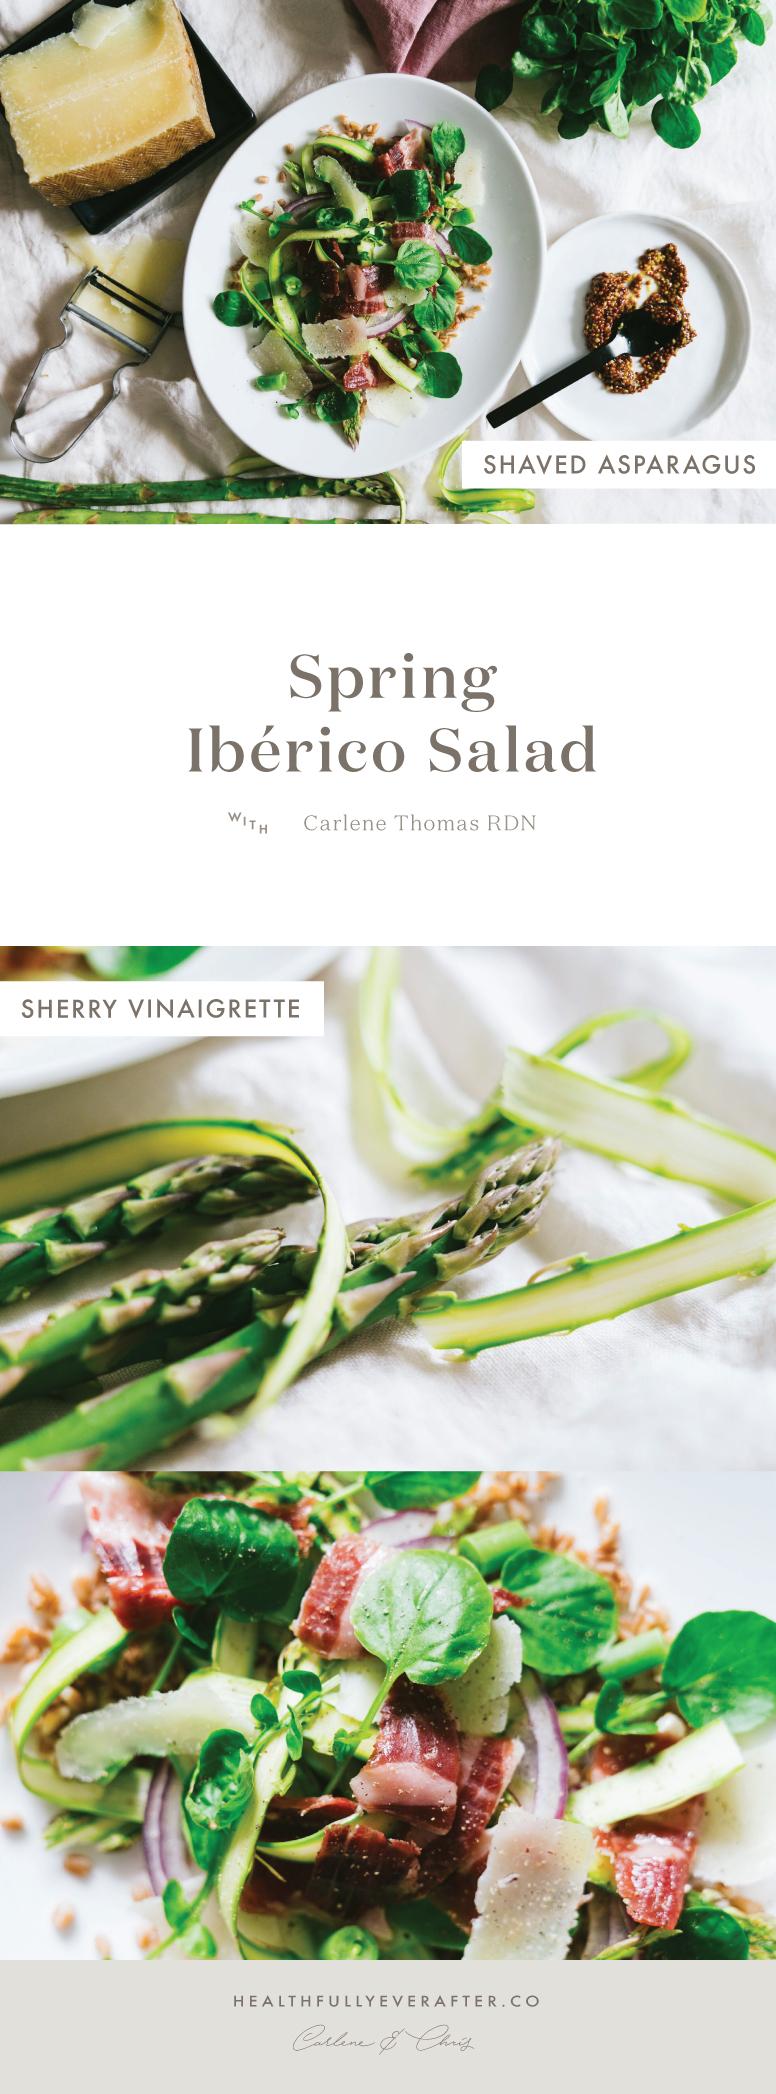 jamon iberico salad